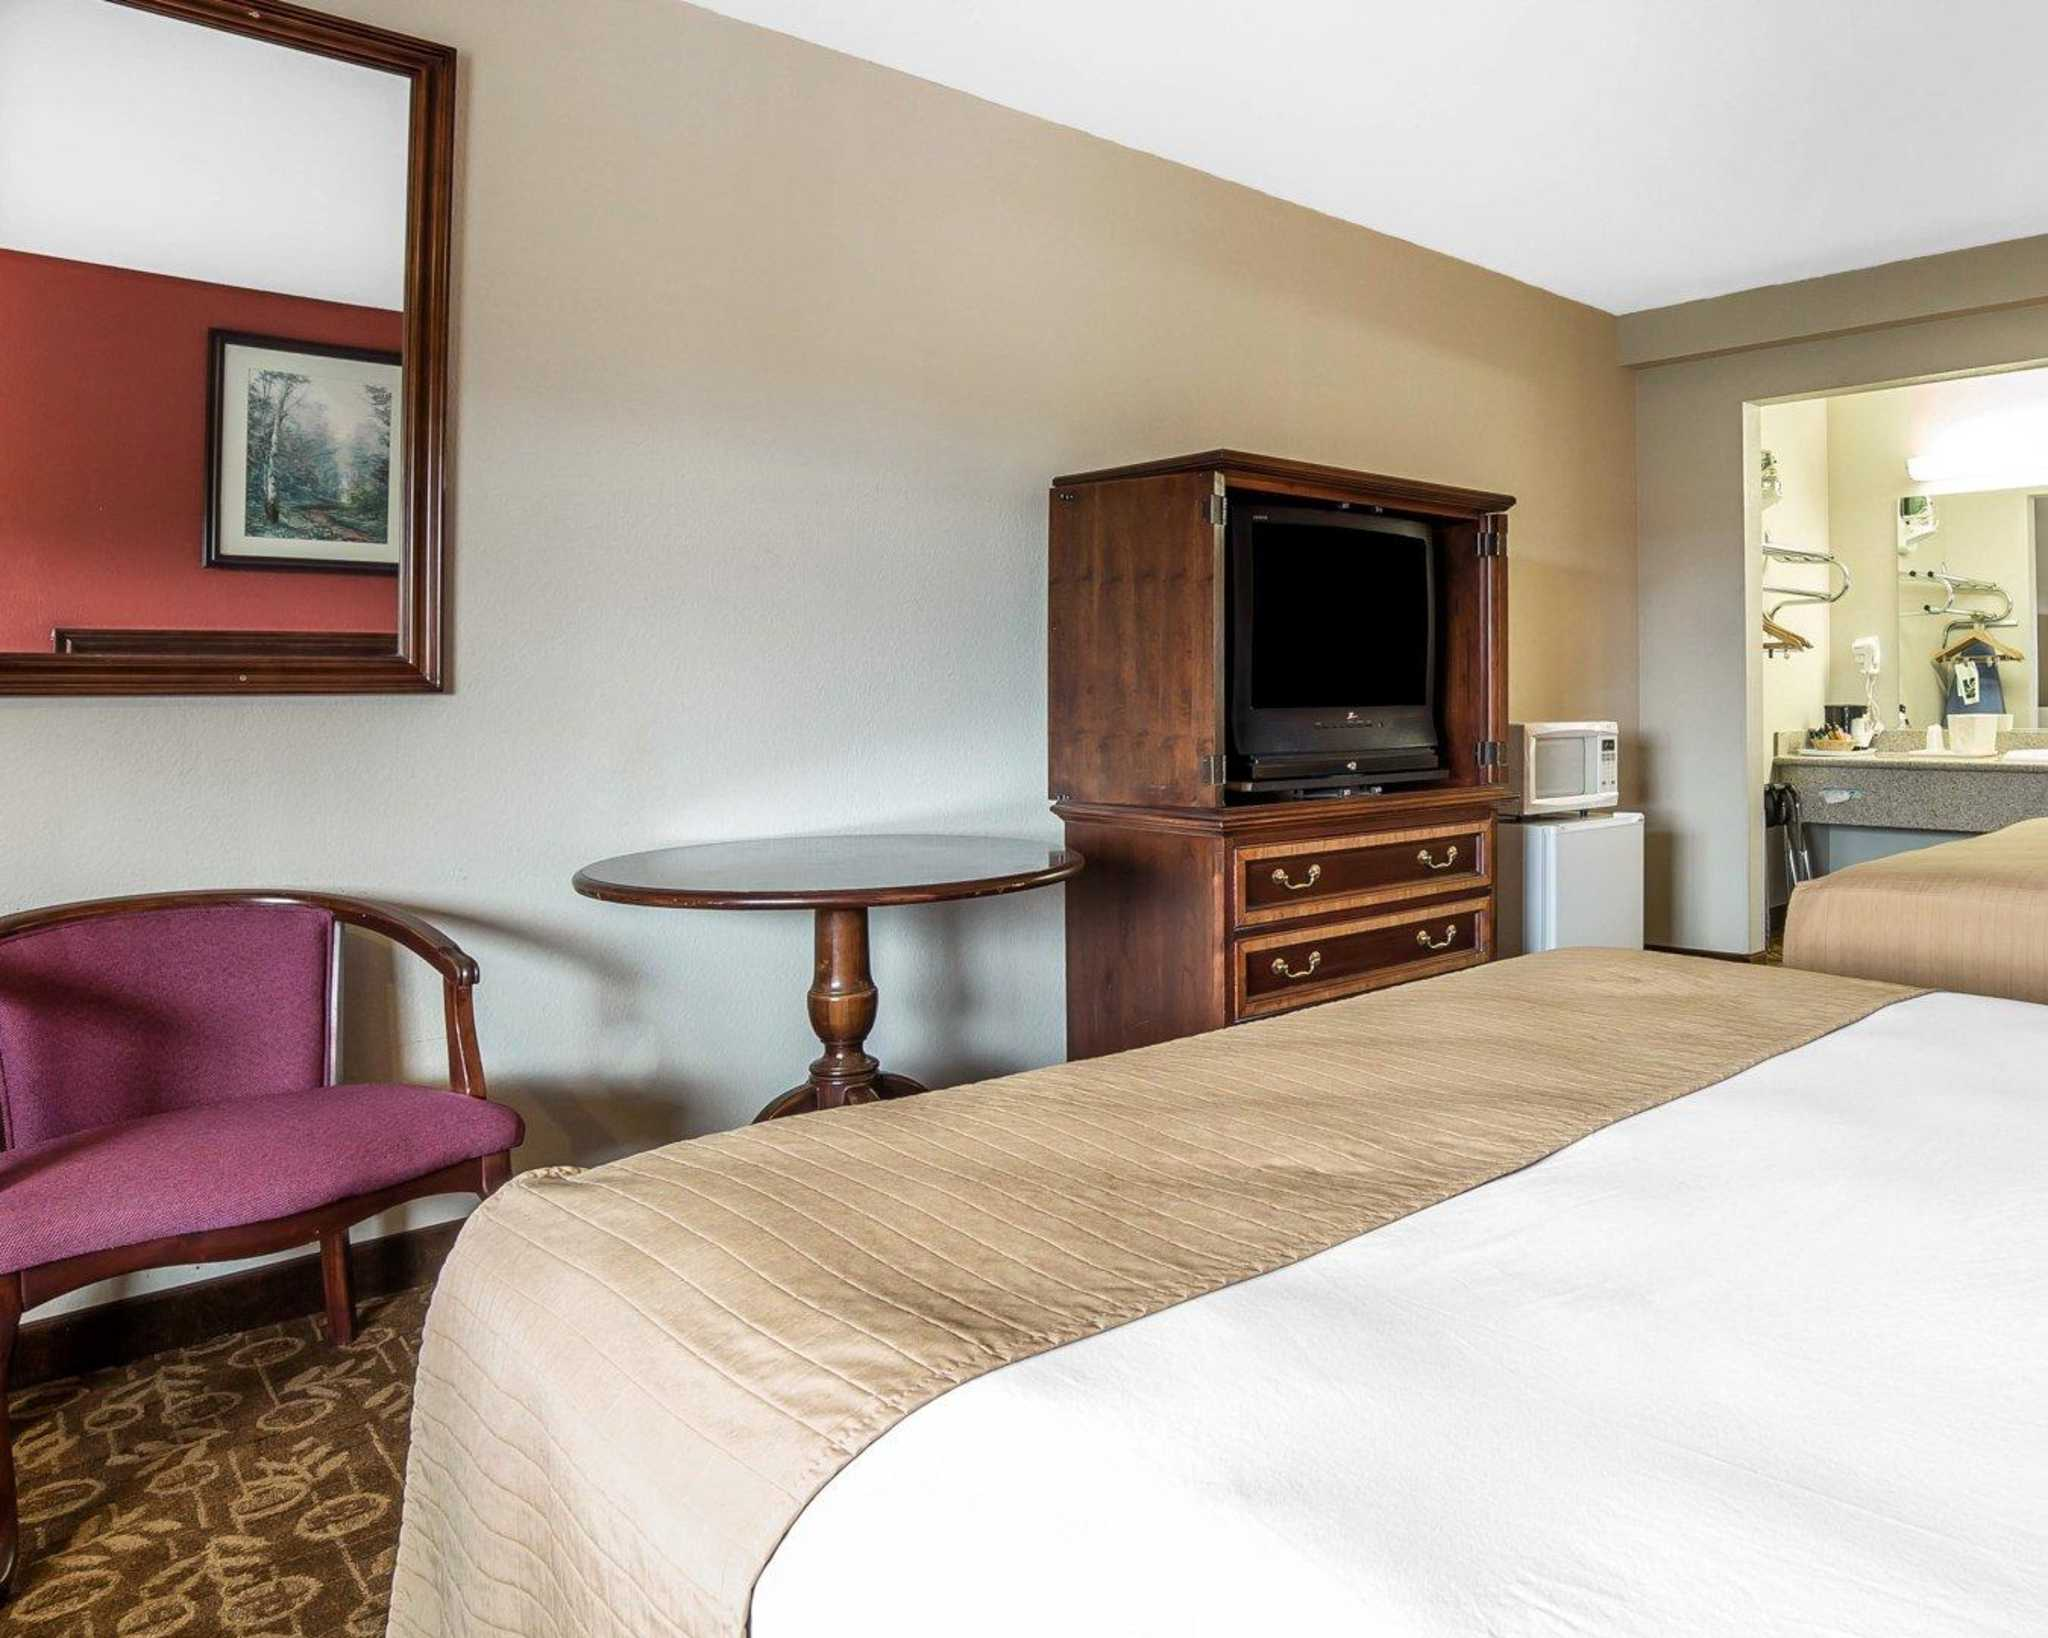 Quality Inn & Suites Minden US-395 image 1